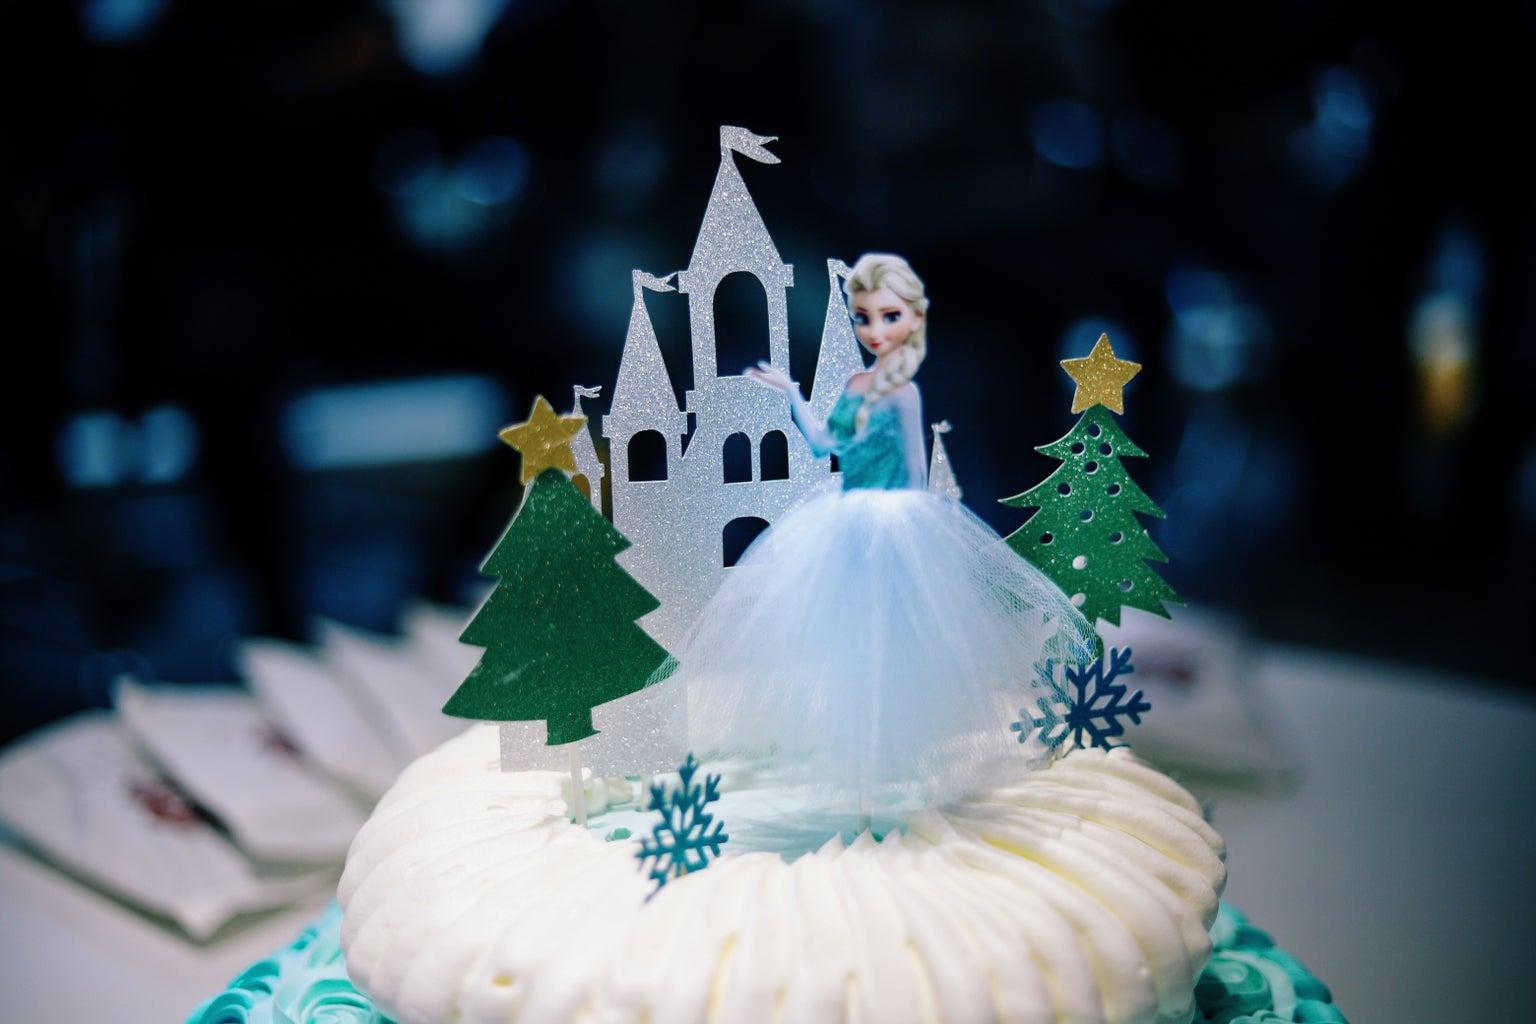 elsa on a cake